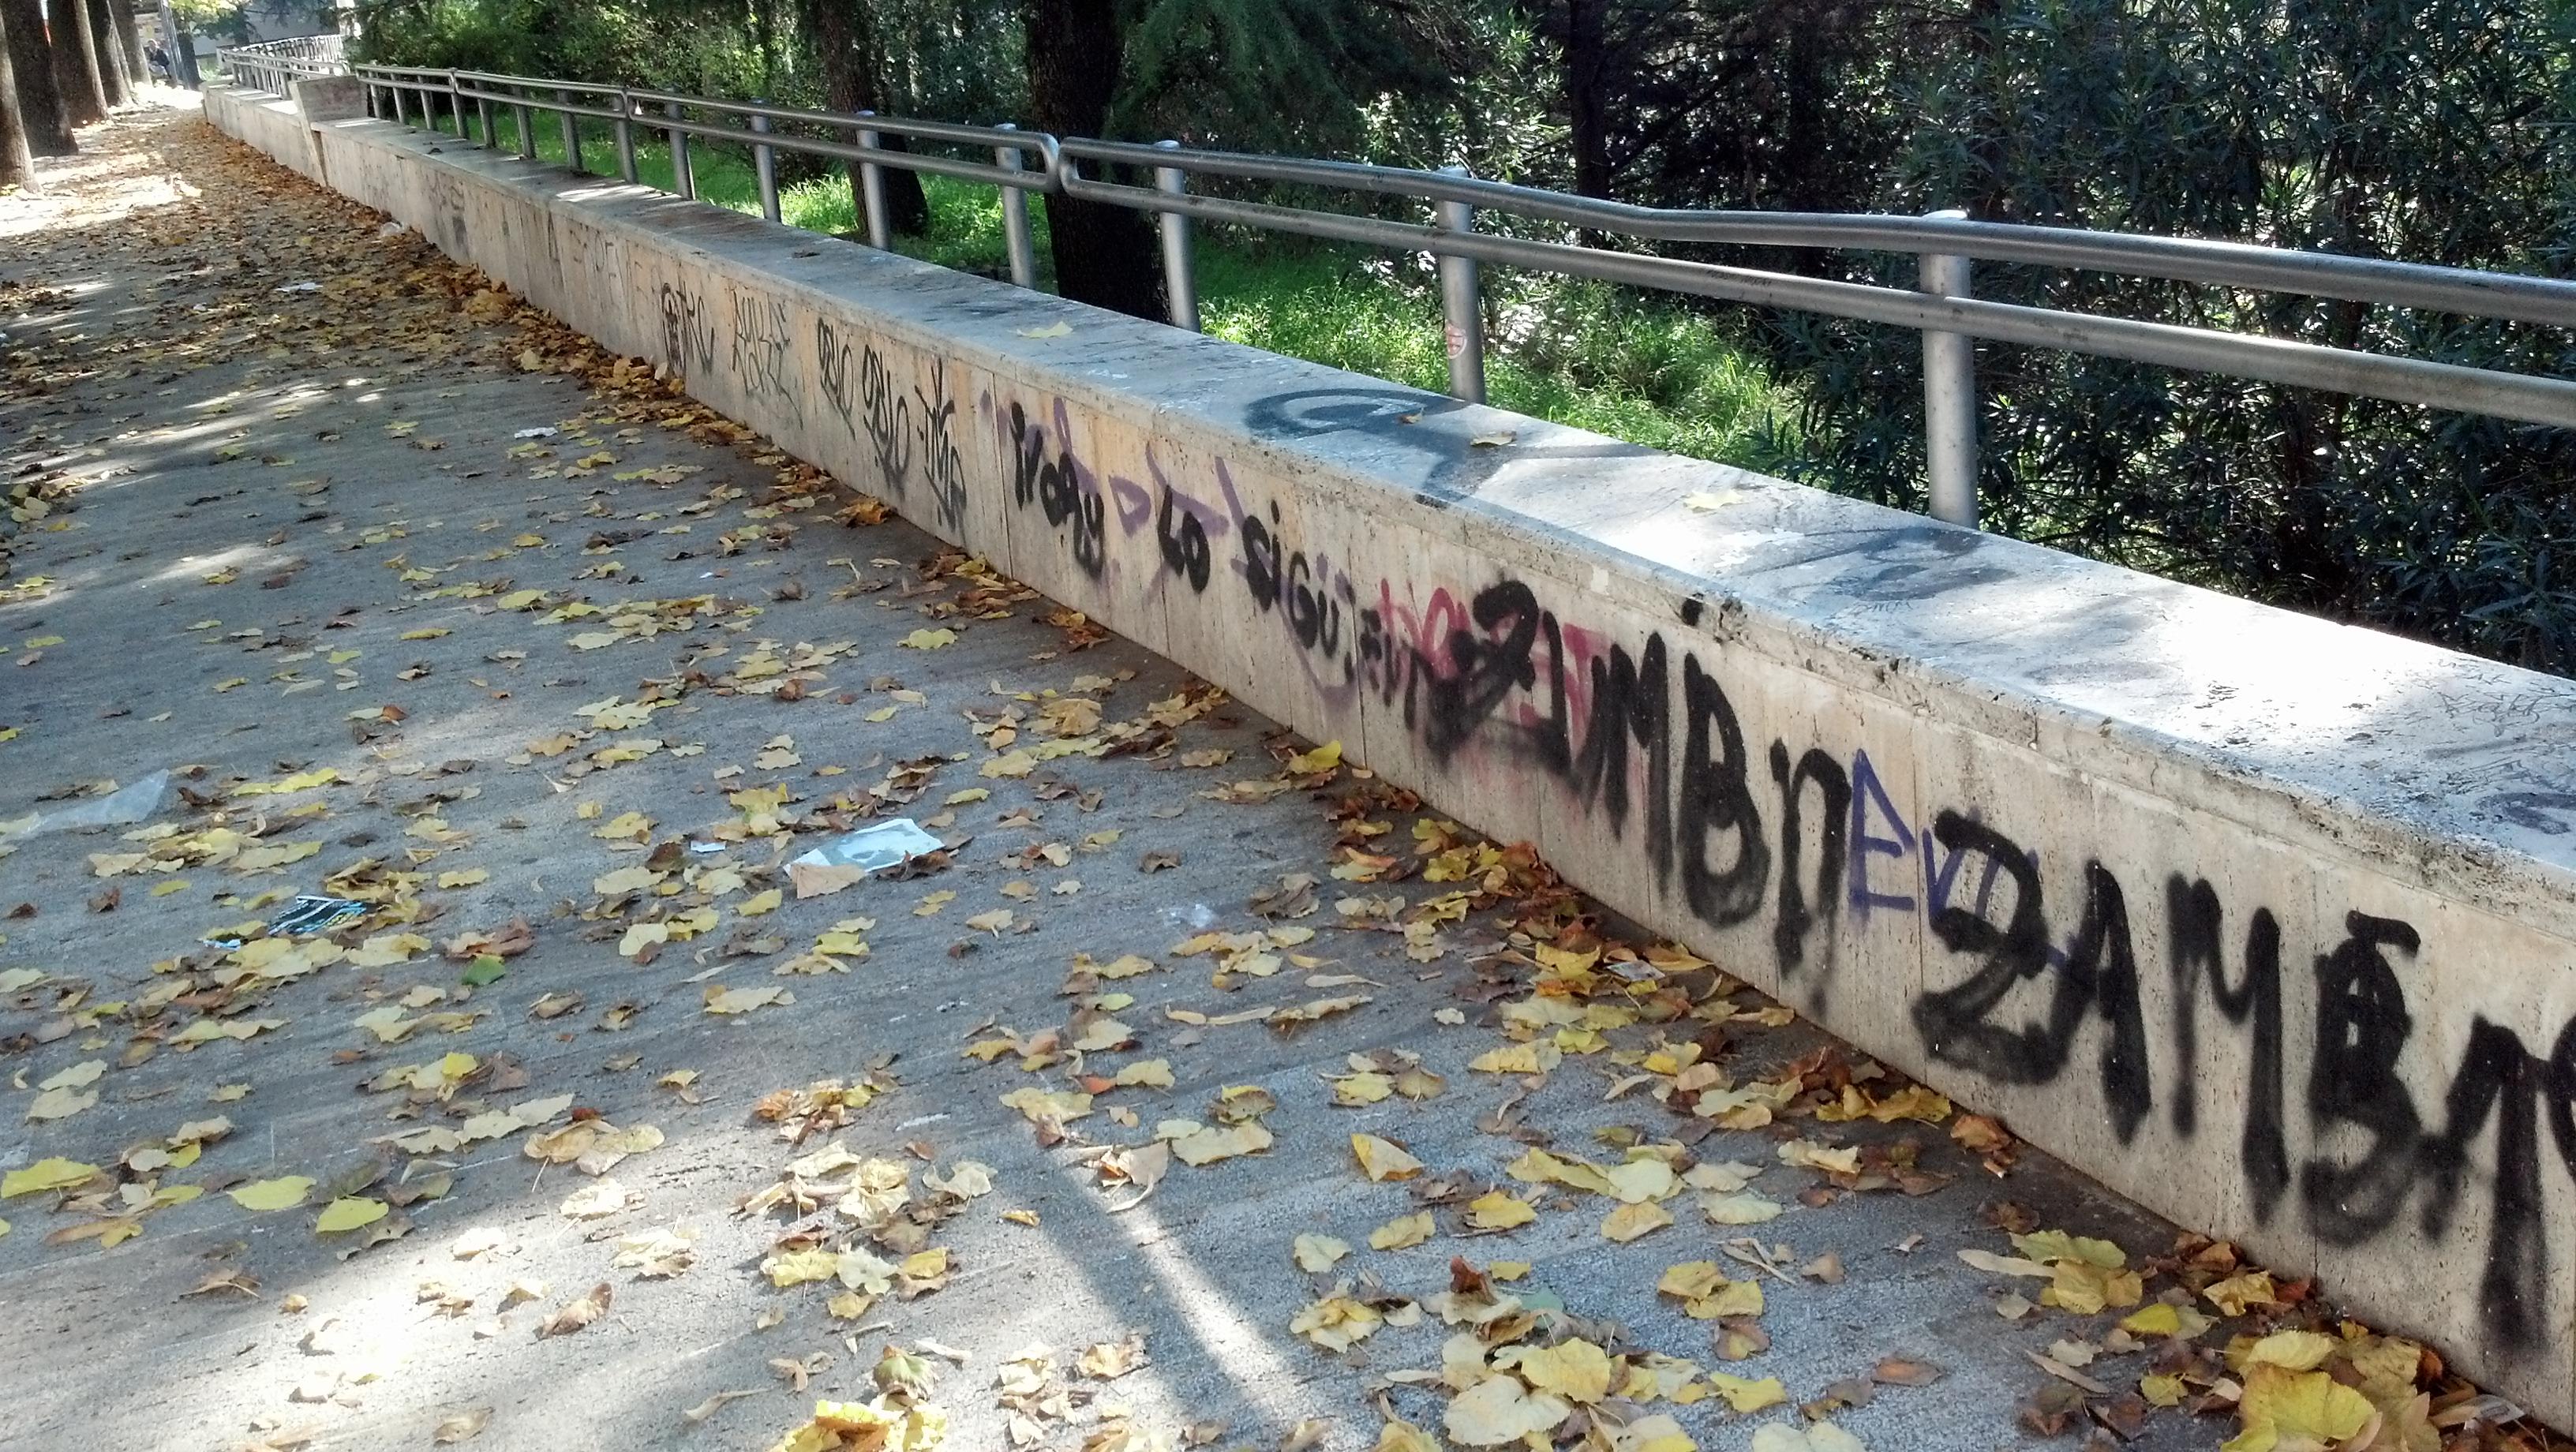 Graffiti ad Ascoli, ottobre 2012 7